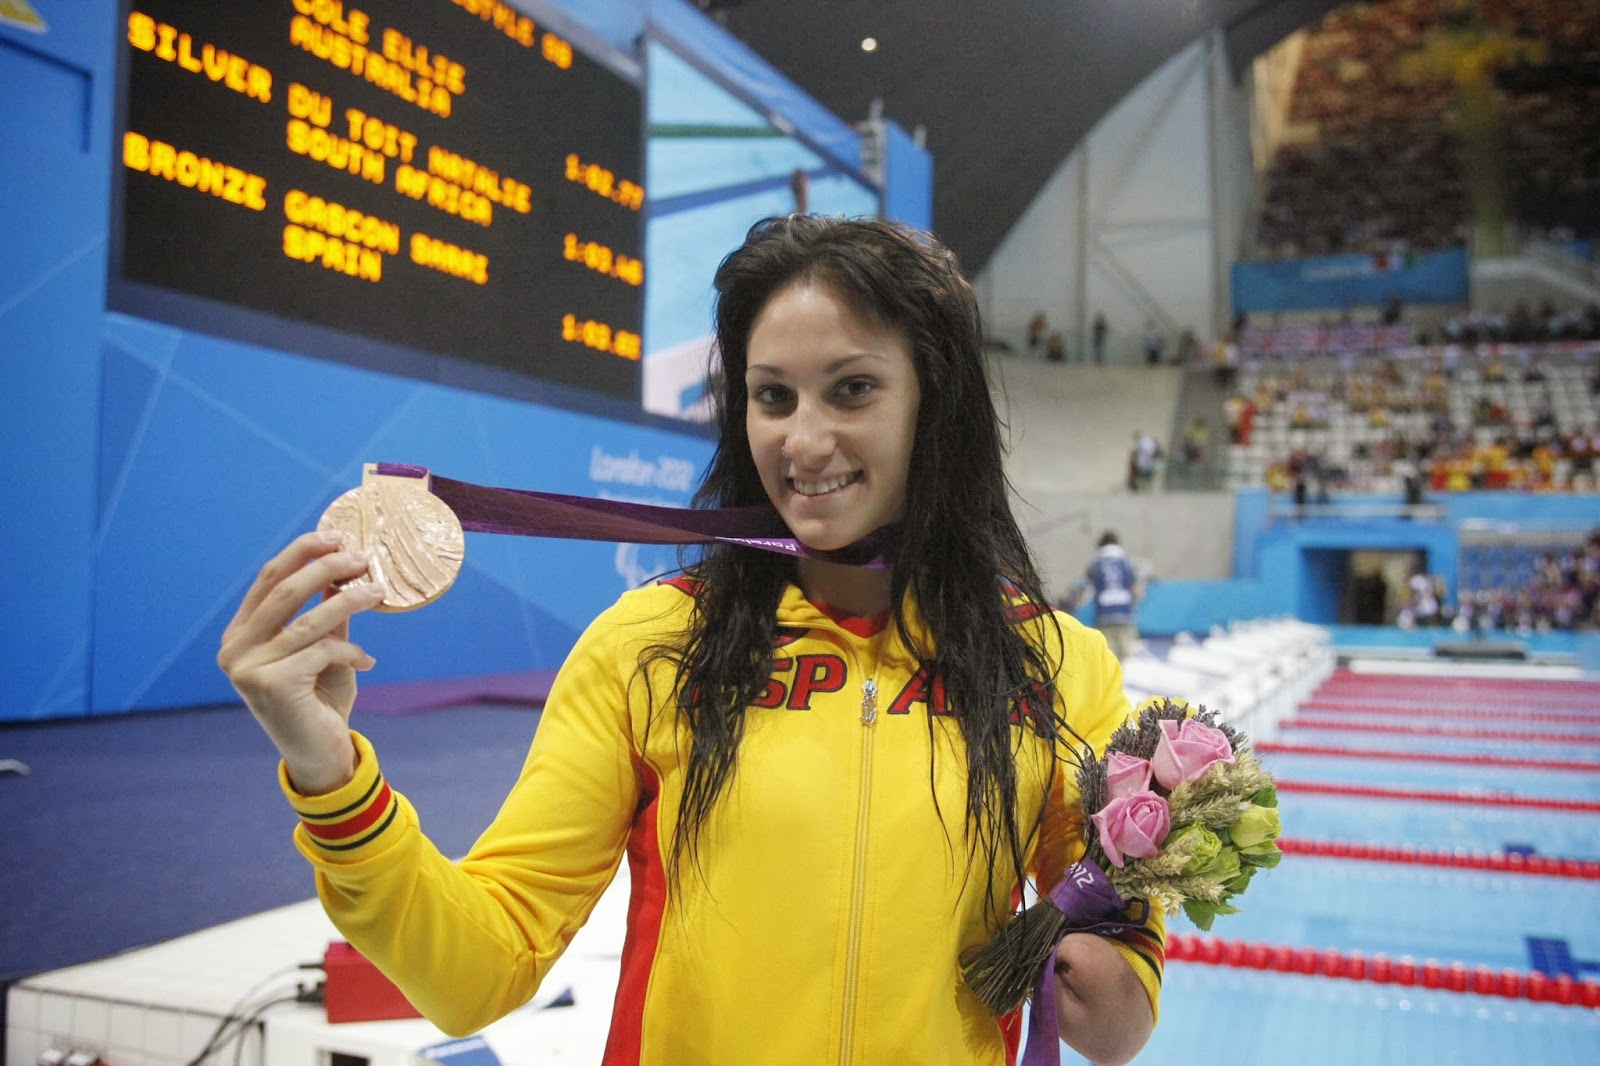 La FCEDF Entrevista A Quatre Nedadors Paralímpics Que Seran A Rio